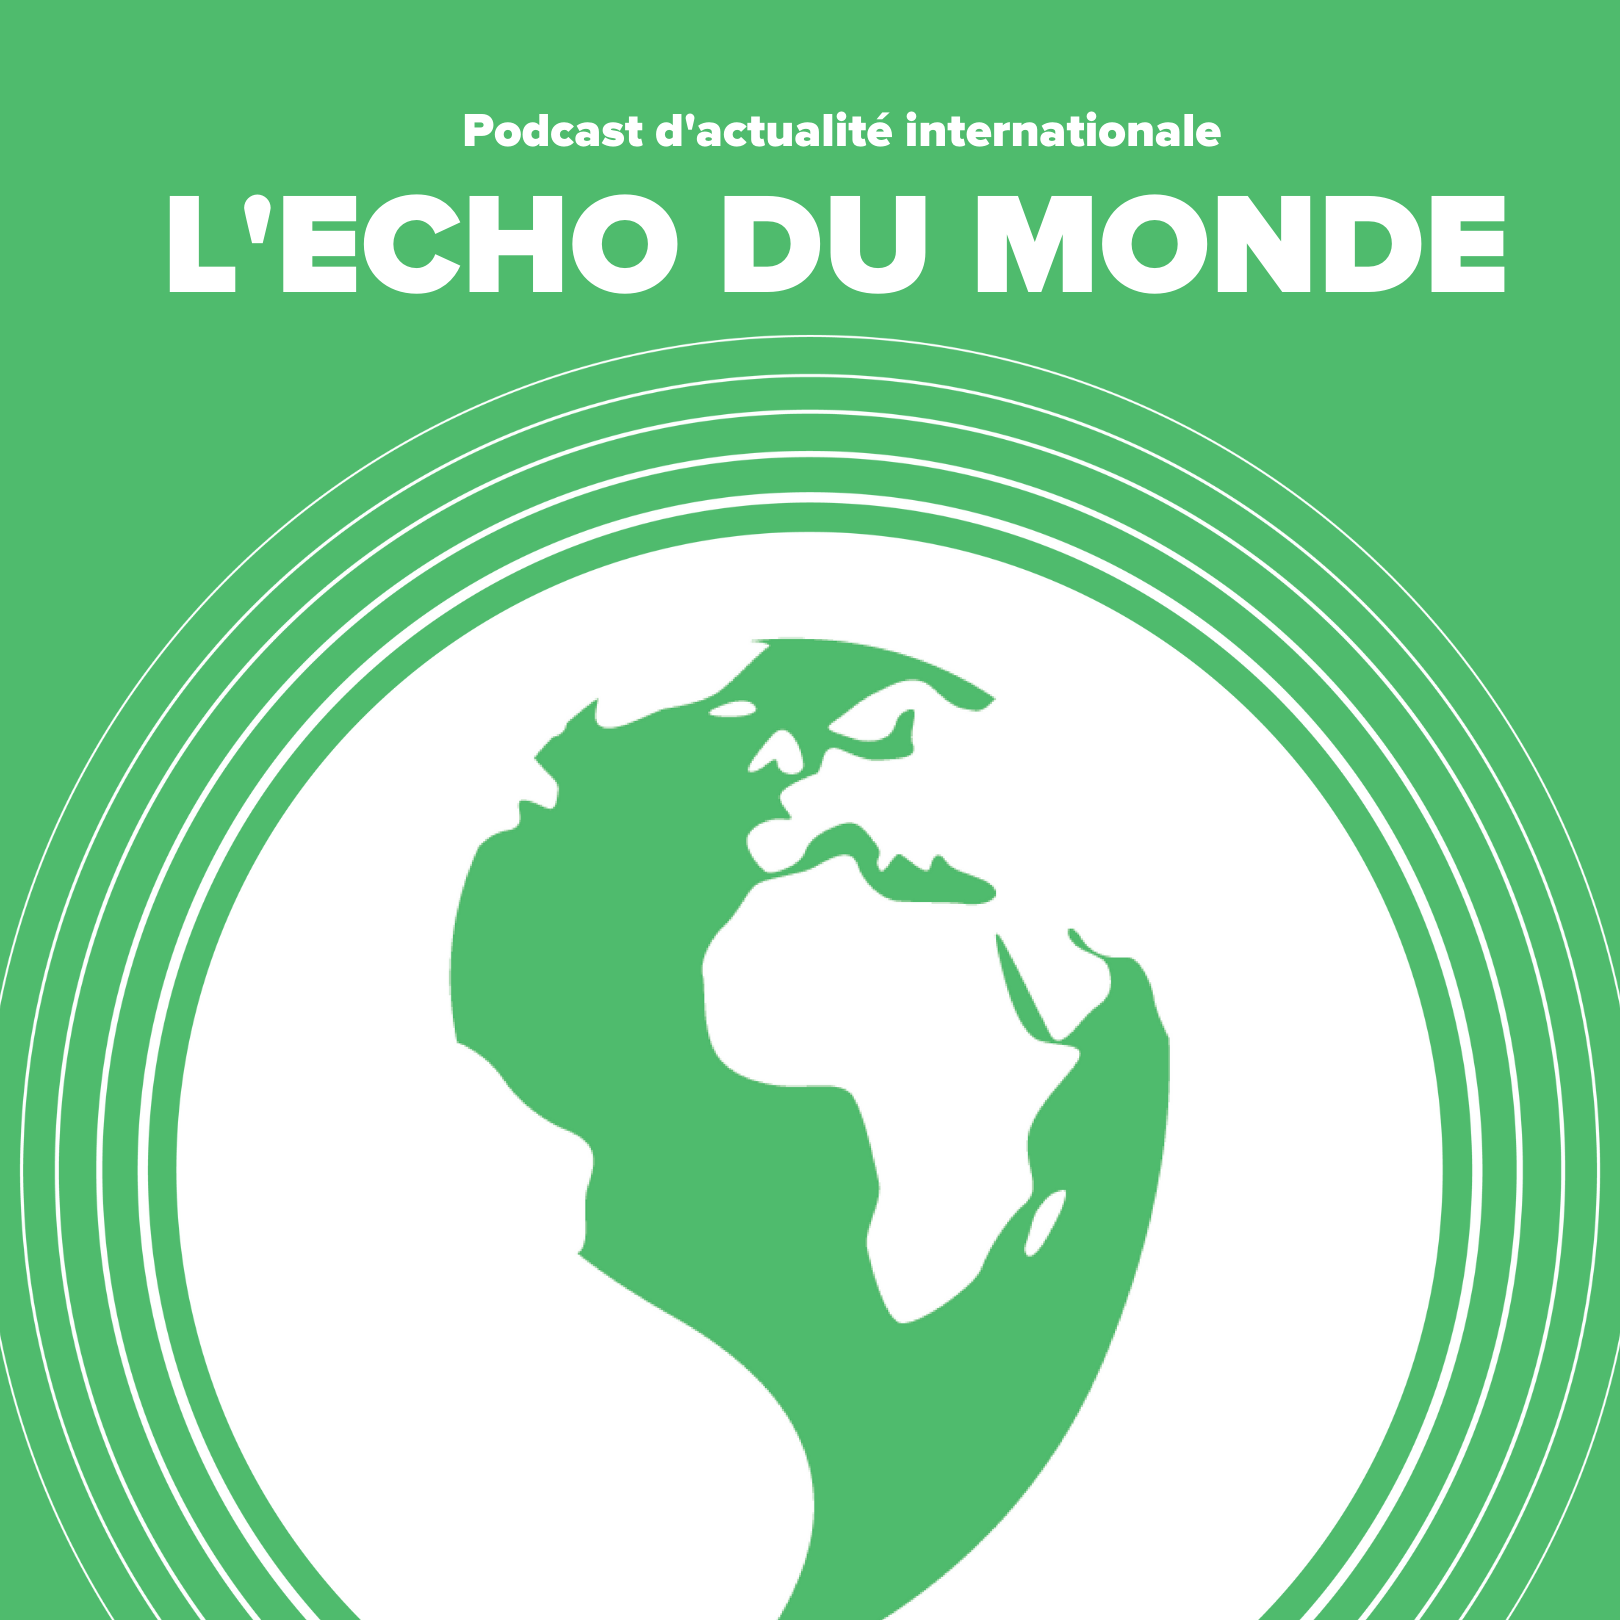 L'Echo du Monde